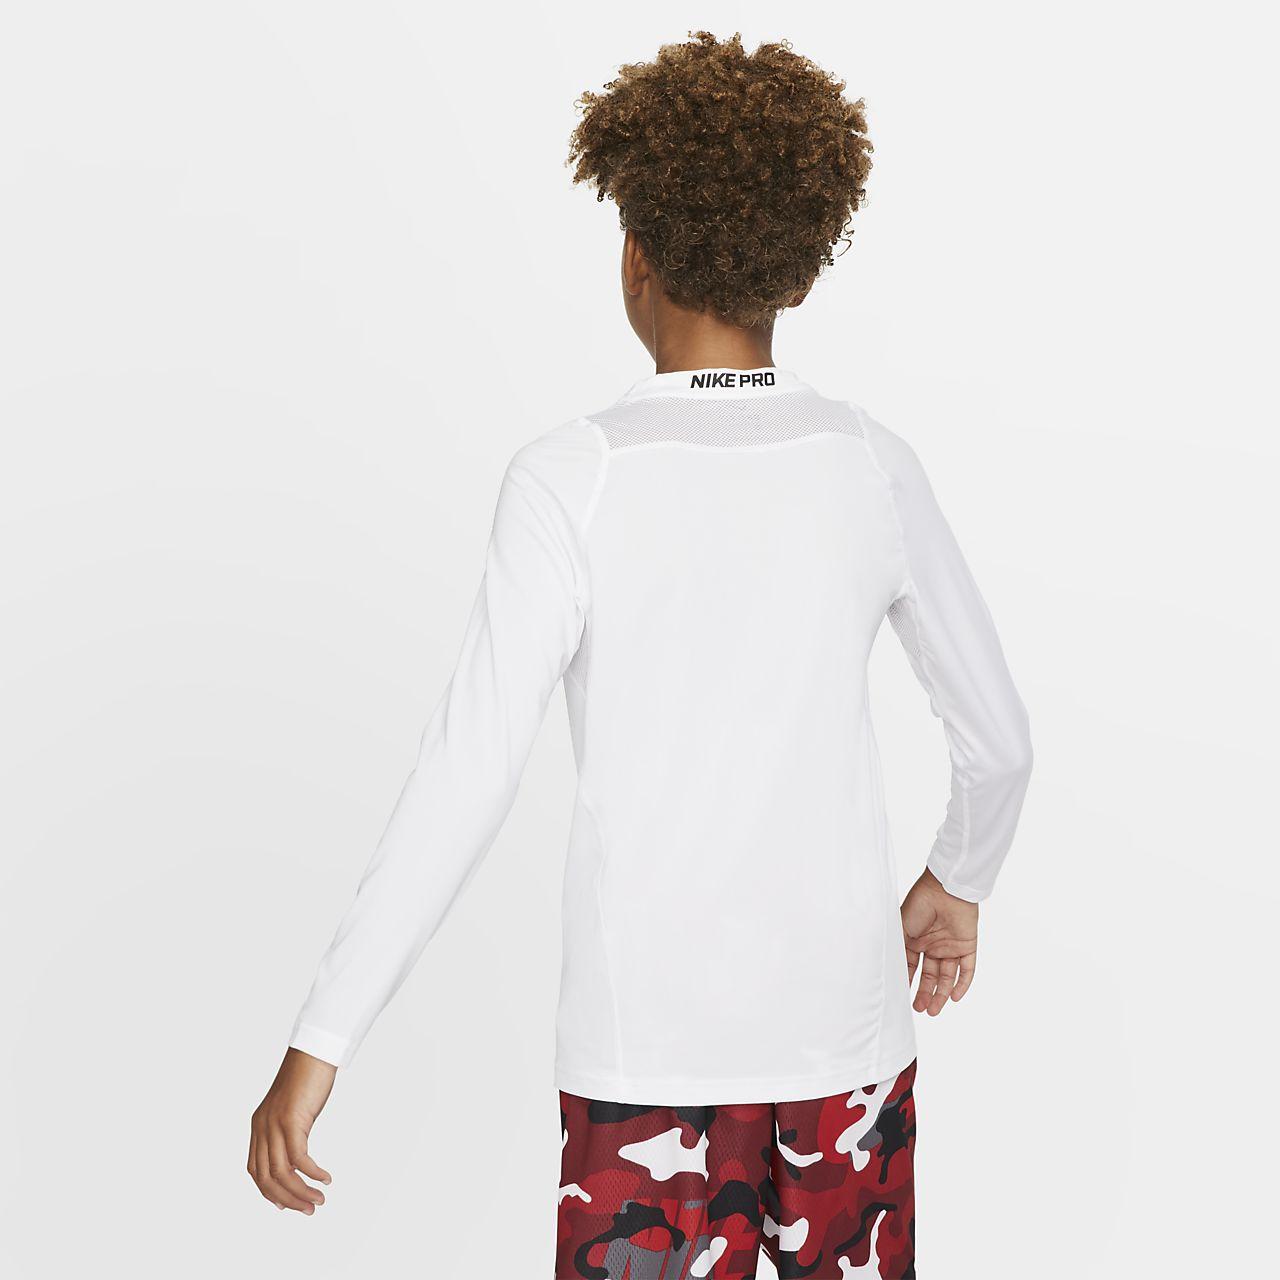 e28818fe3 Nike Pro Big Kids' (Boys') Long Sleeve Training Top. Nike.com